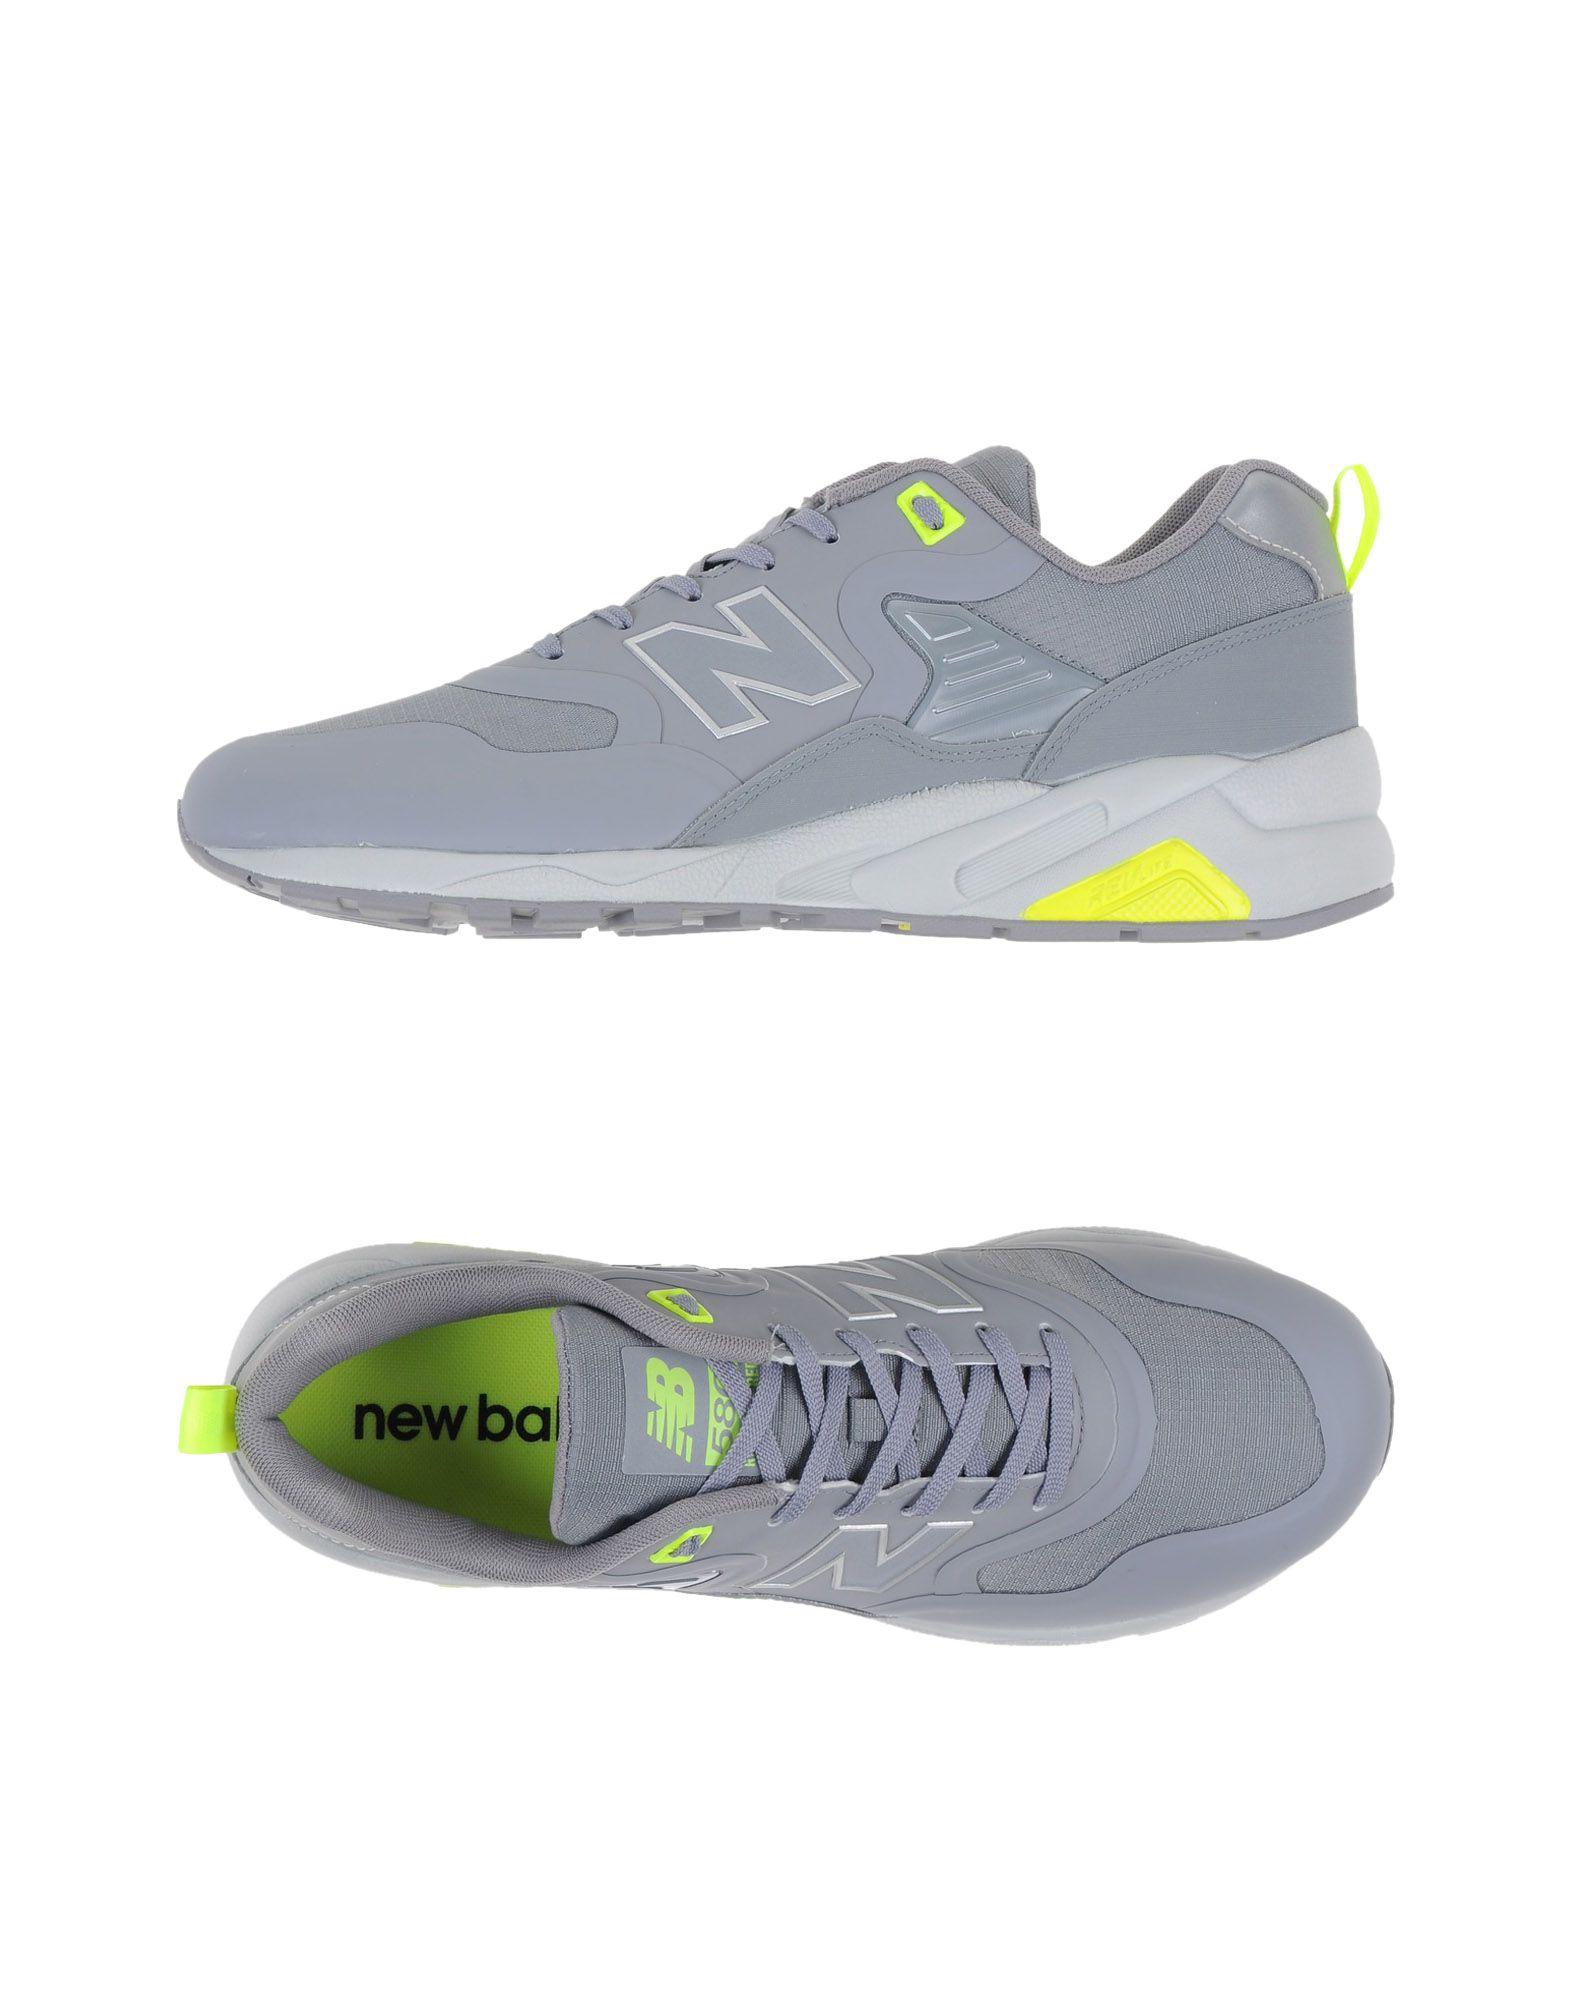 Sneakers New Balance 580 Brights - Uomo - Acquista online su